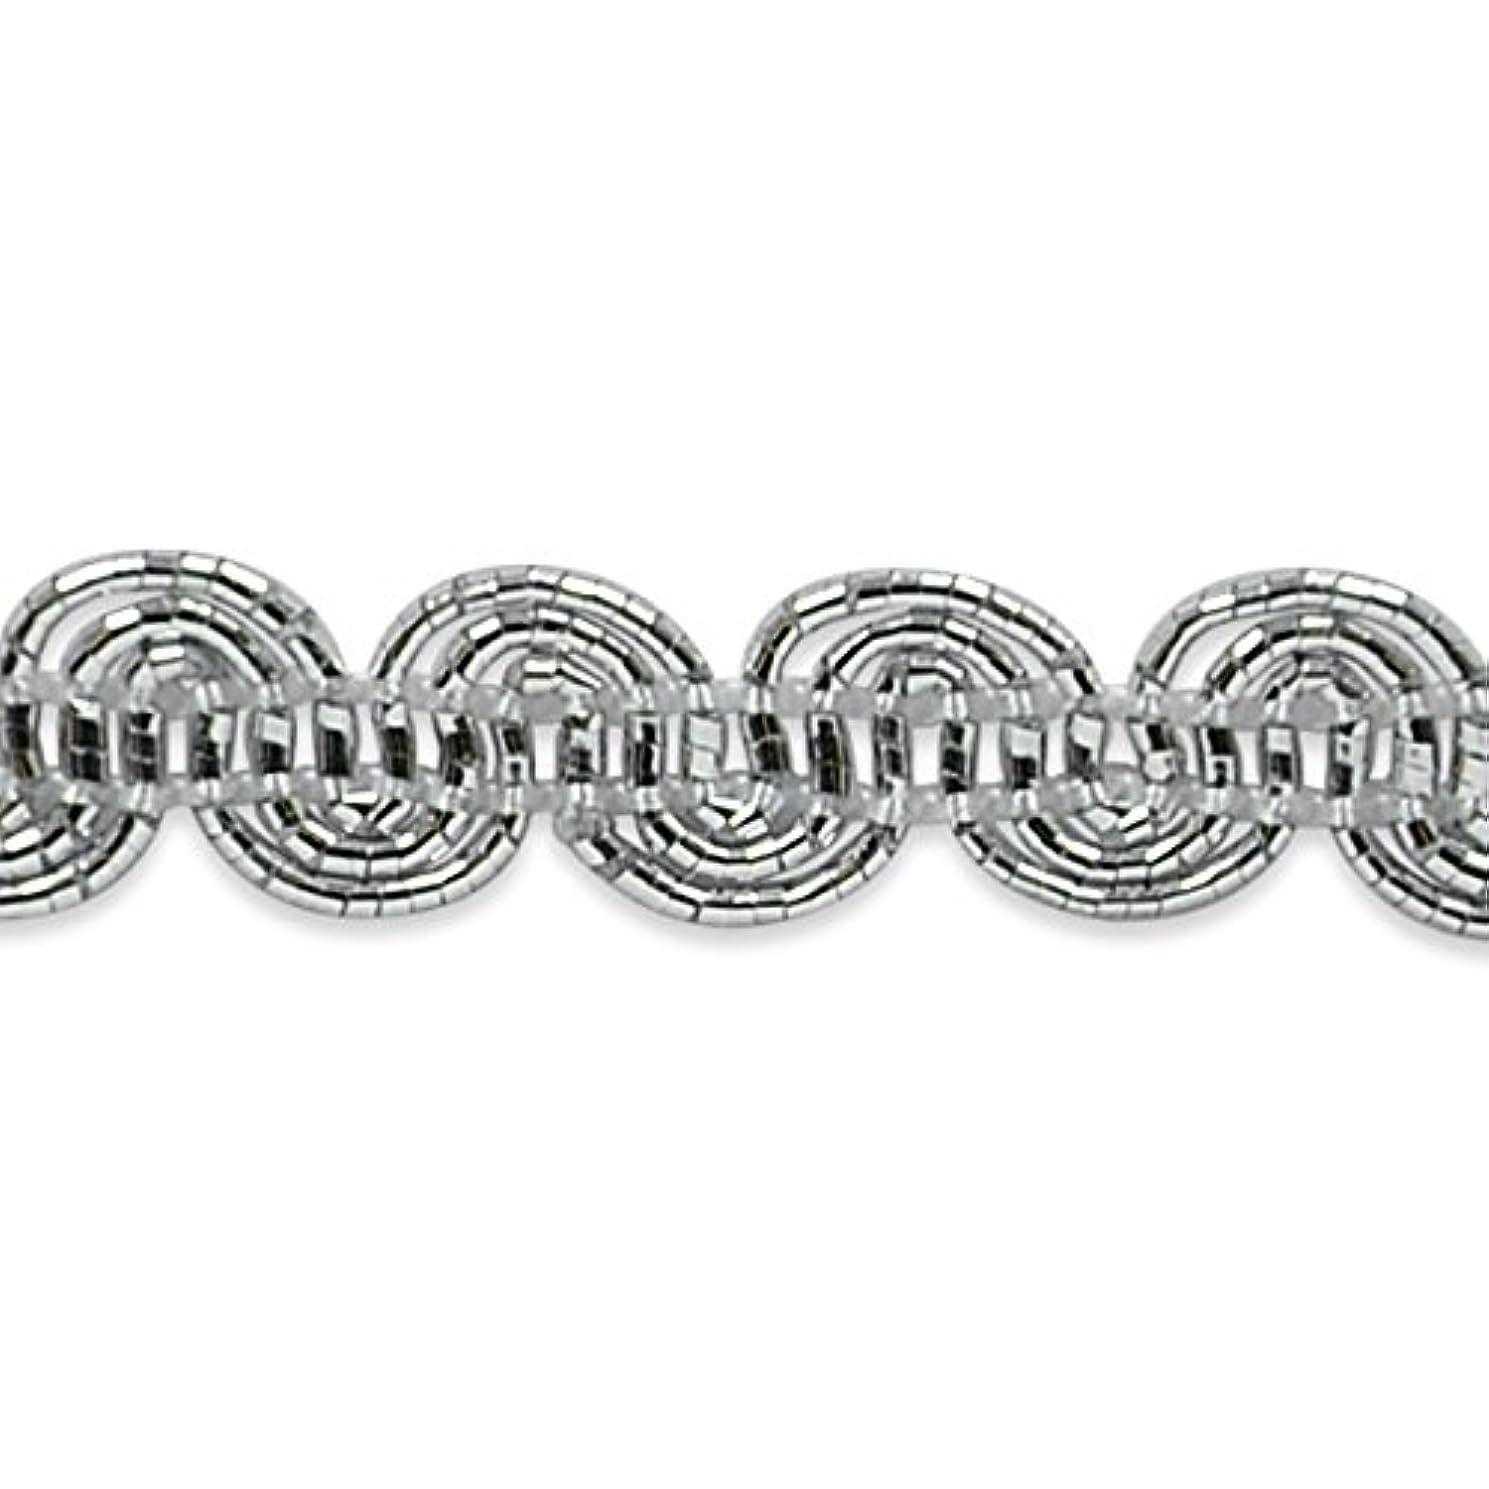 Expo International Pia Metallic Scroll Braid Trim Embellishment, 20-Yard, Silver